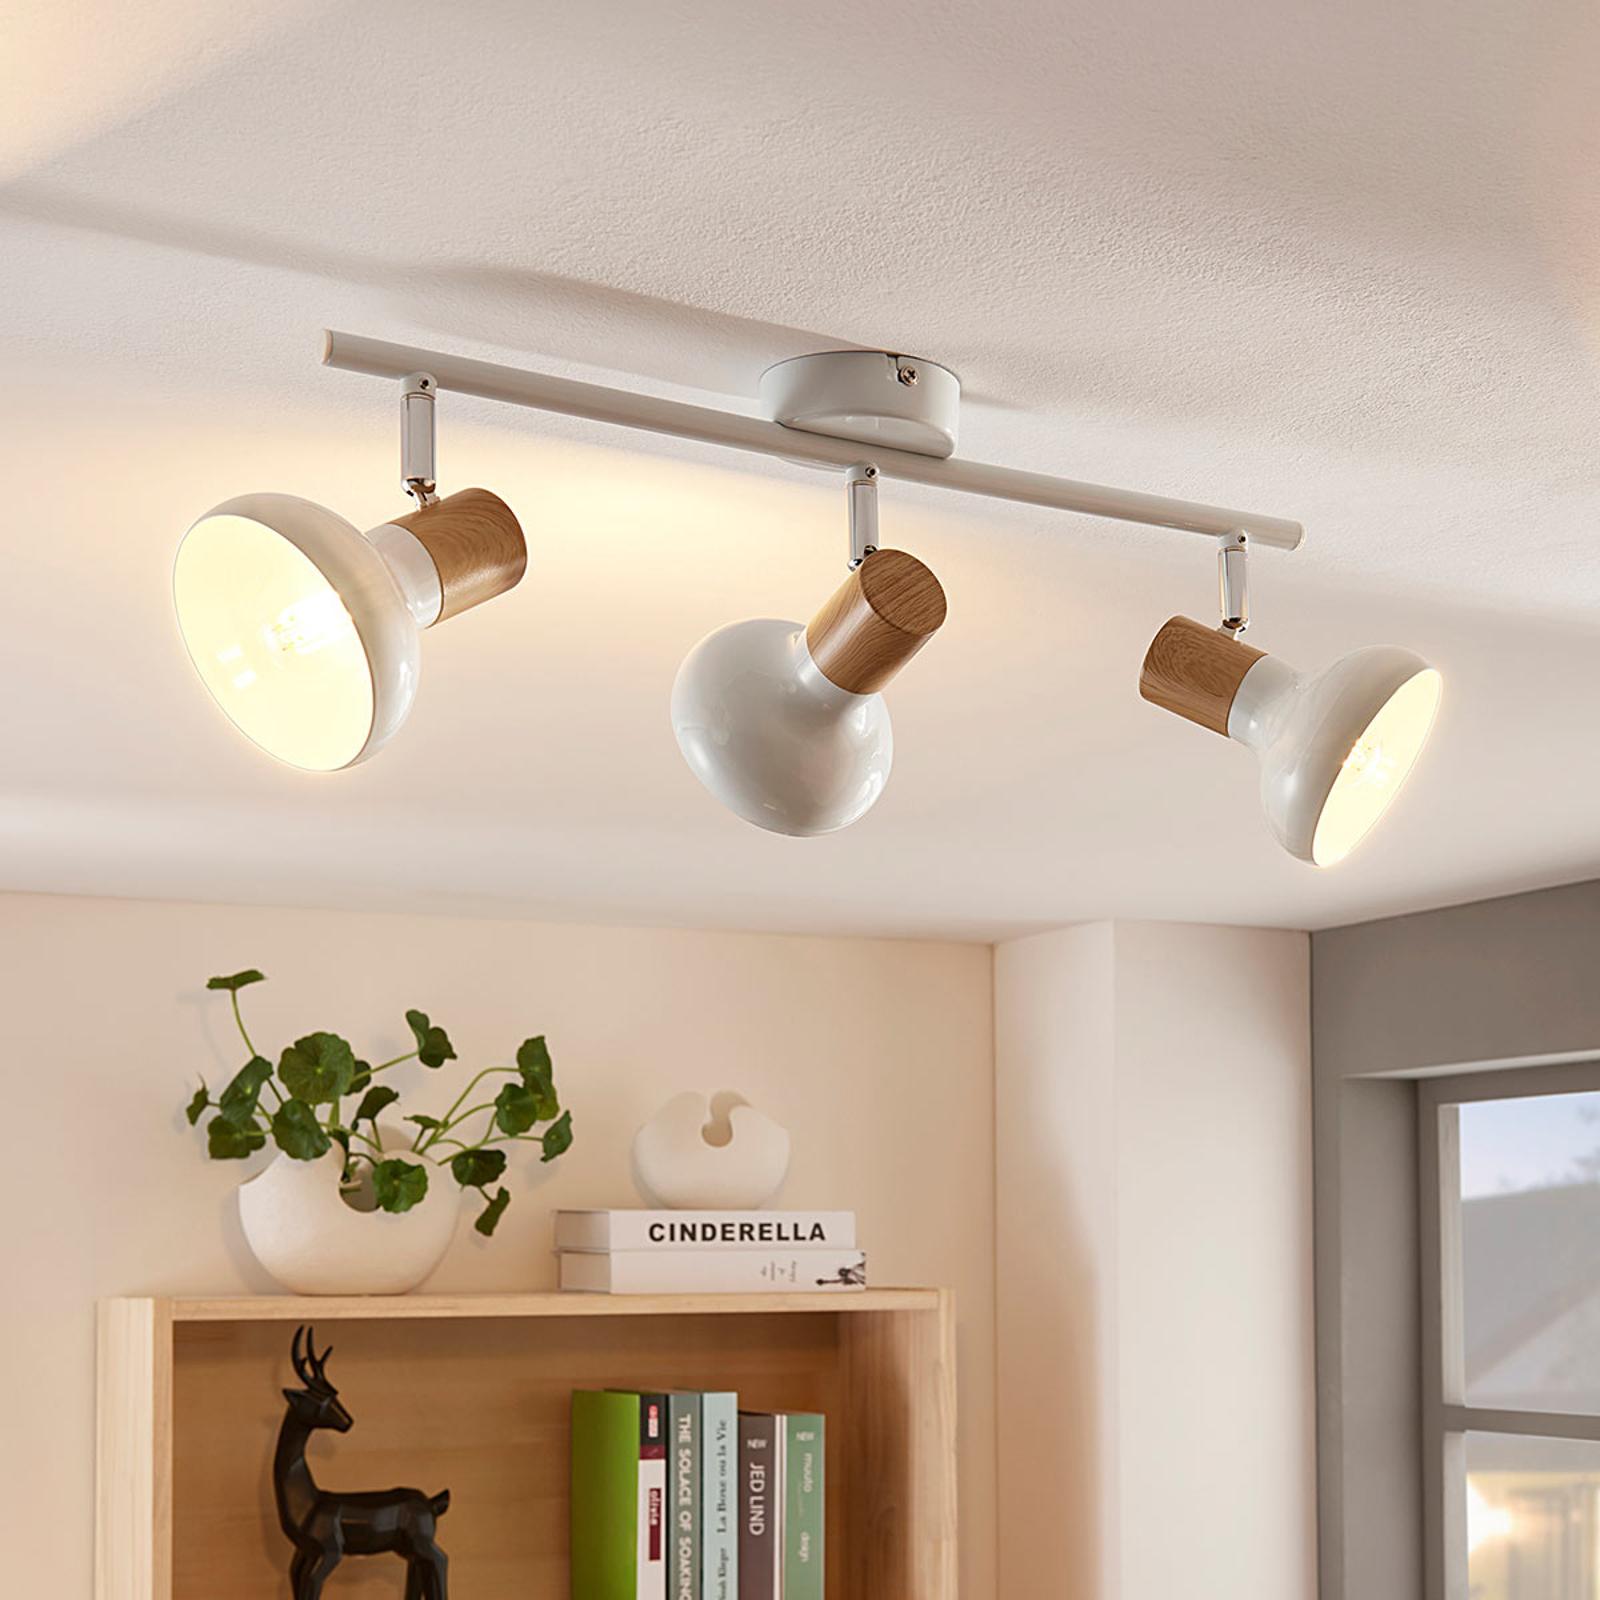 Plafonnier Fridolin à 3 lampes, en métal